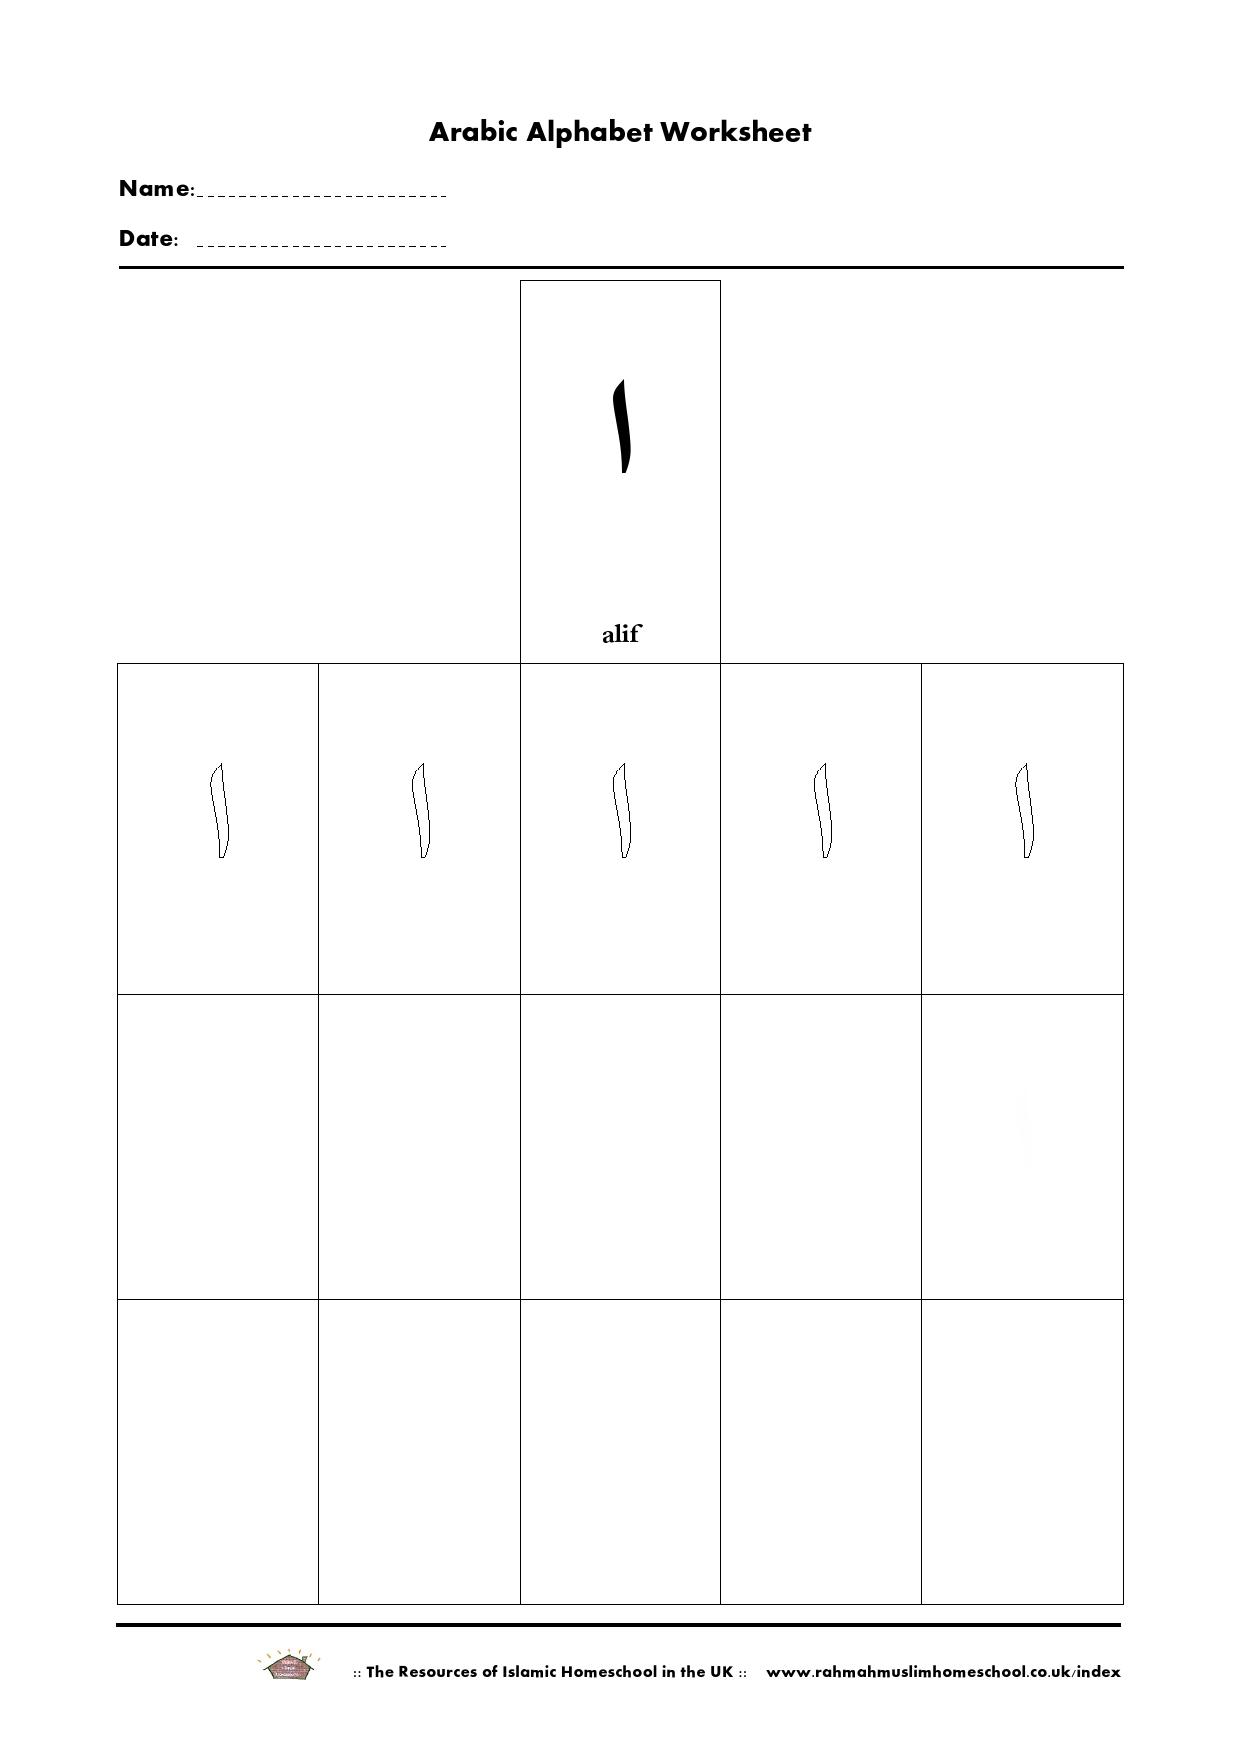 Free Arabic Alphabet Worksheet; Letter Alif ا | The